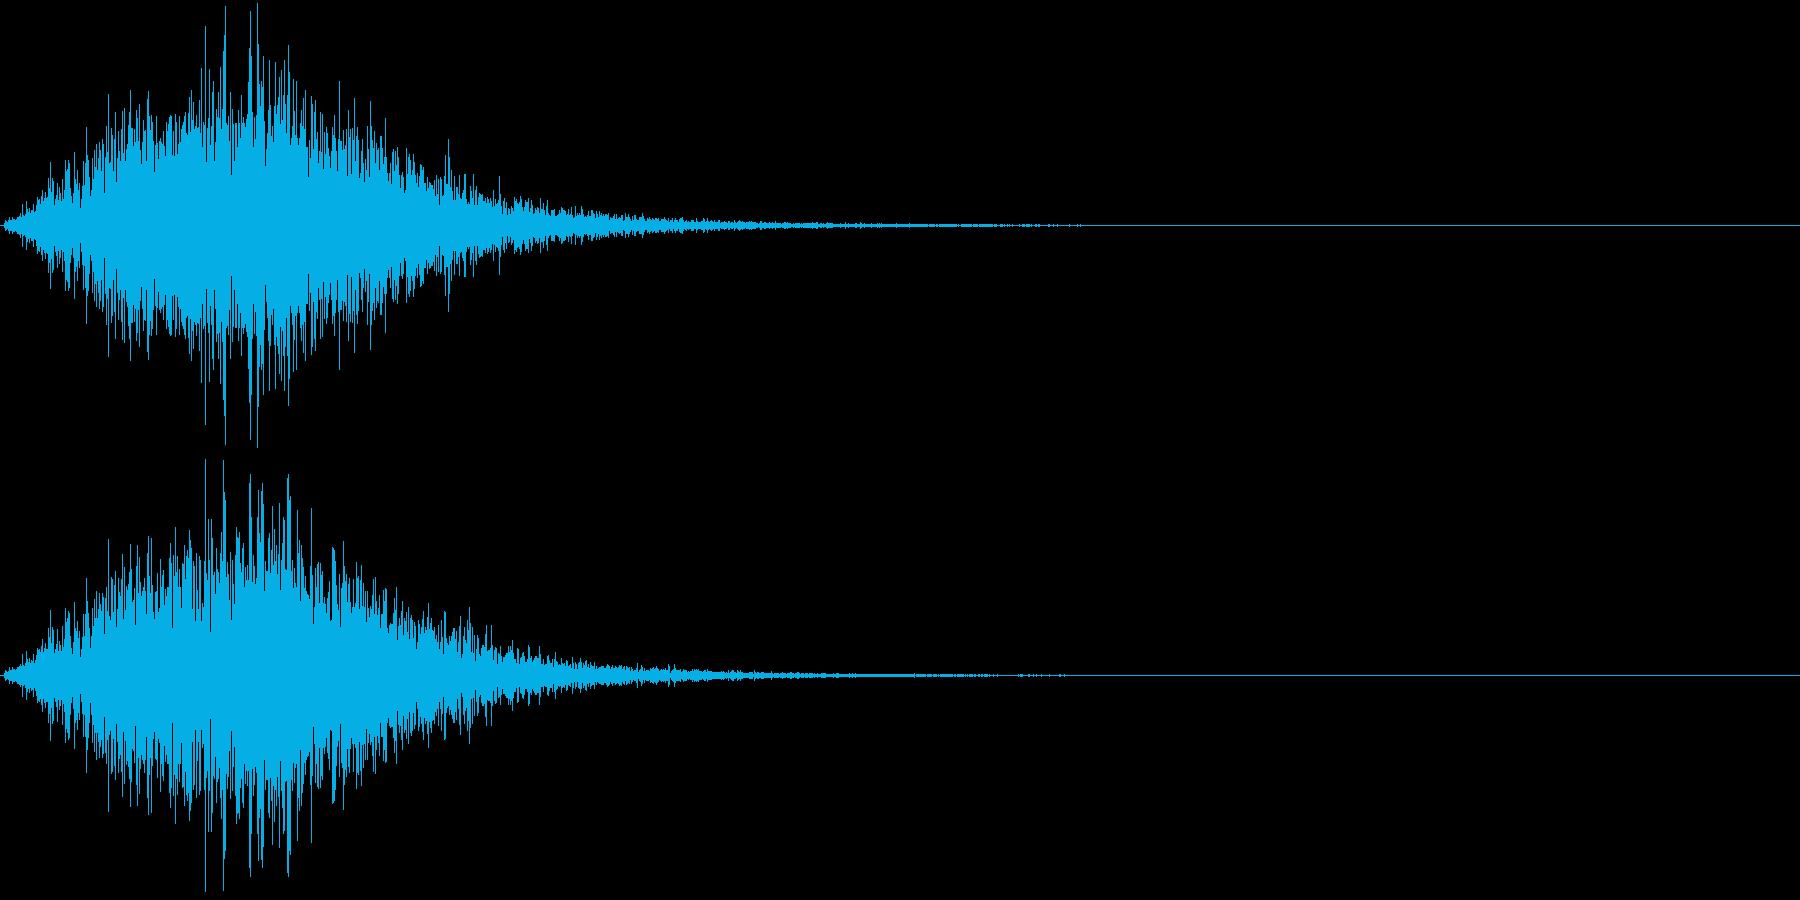 Battle 戦闘エフェクト音 10の再生済みの波形